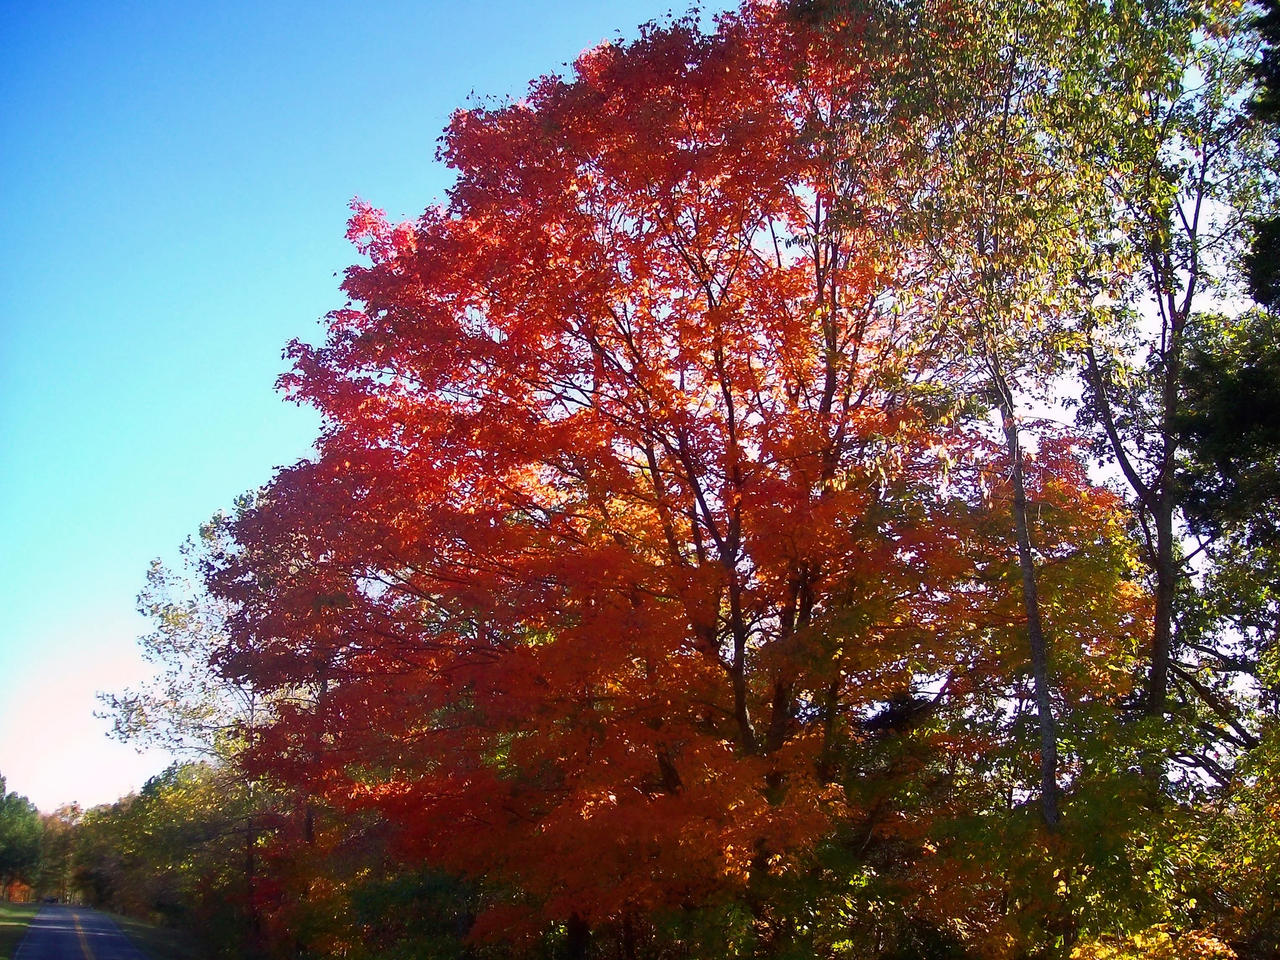 October Sights by Mistshadow2k4